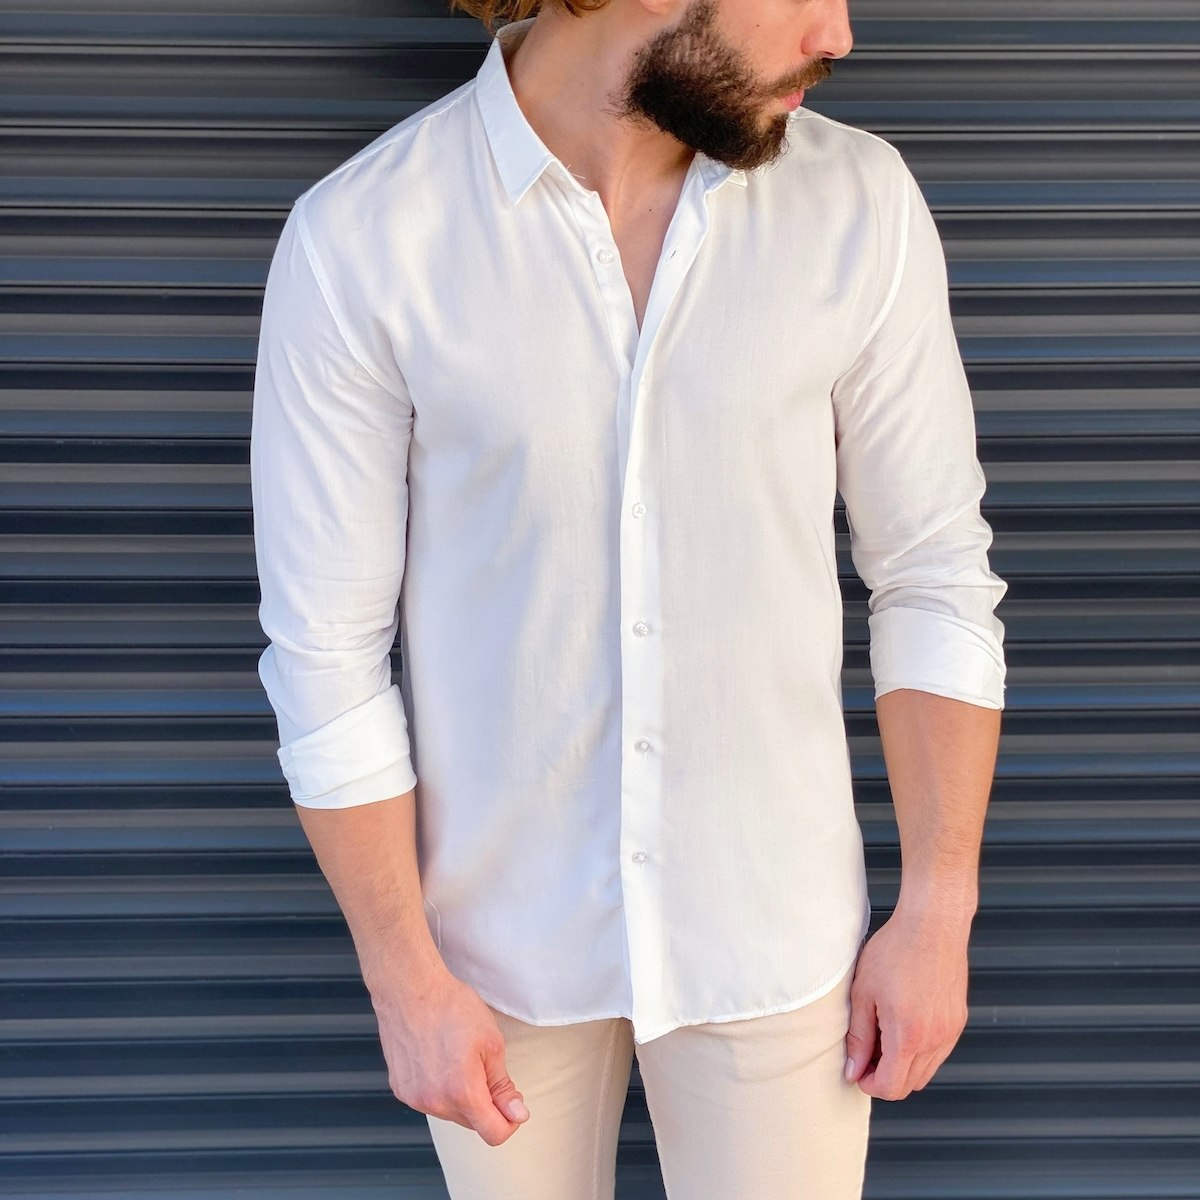 Herren Basic Hemd in weiß